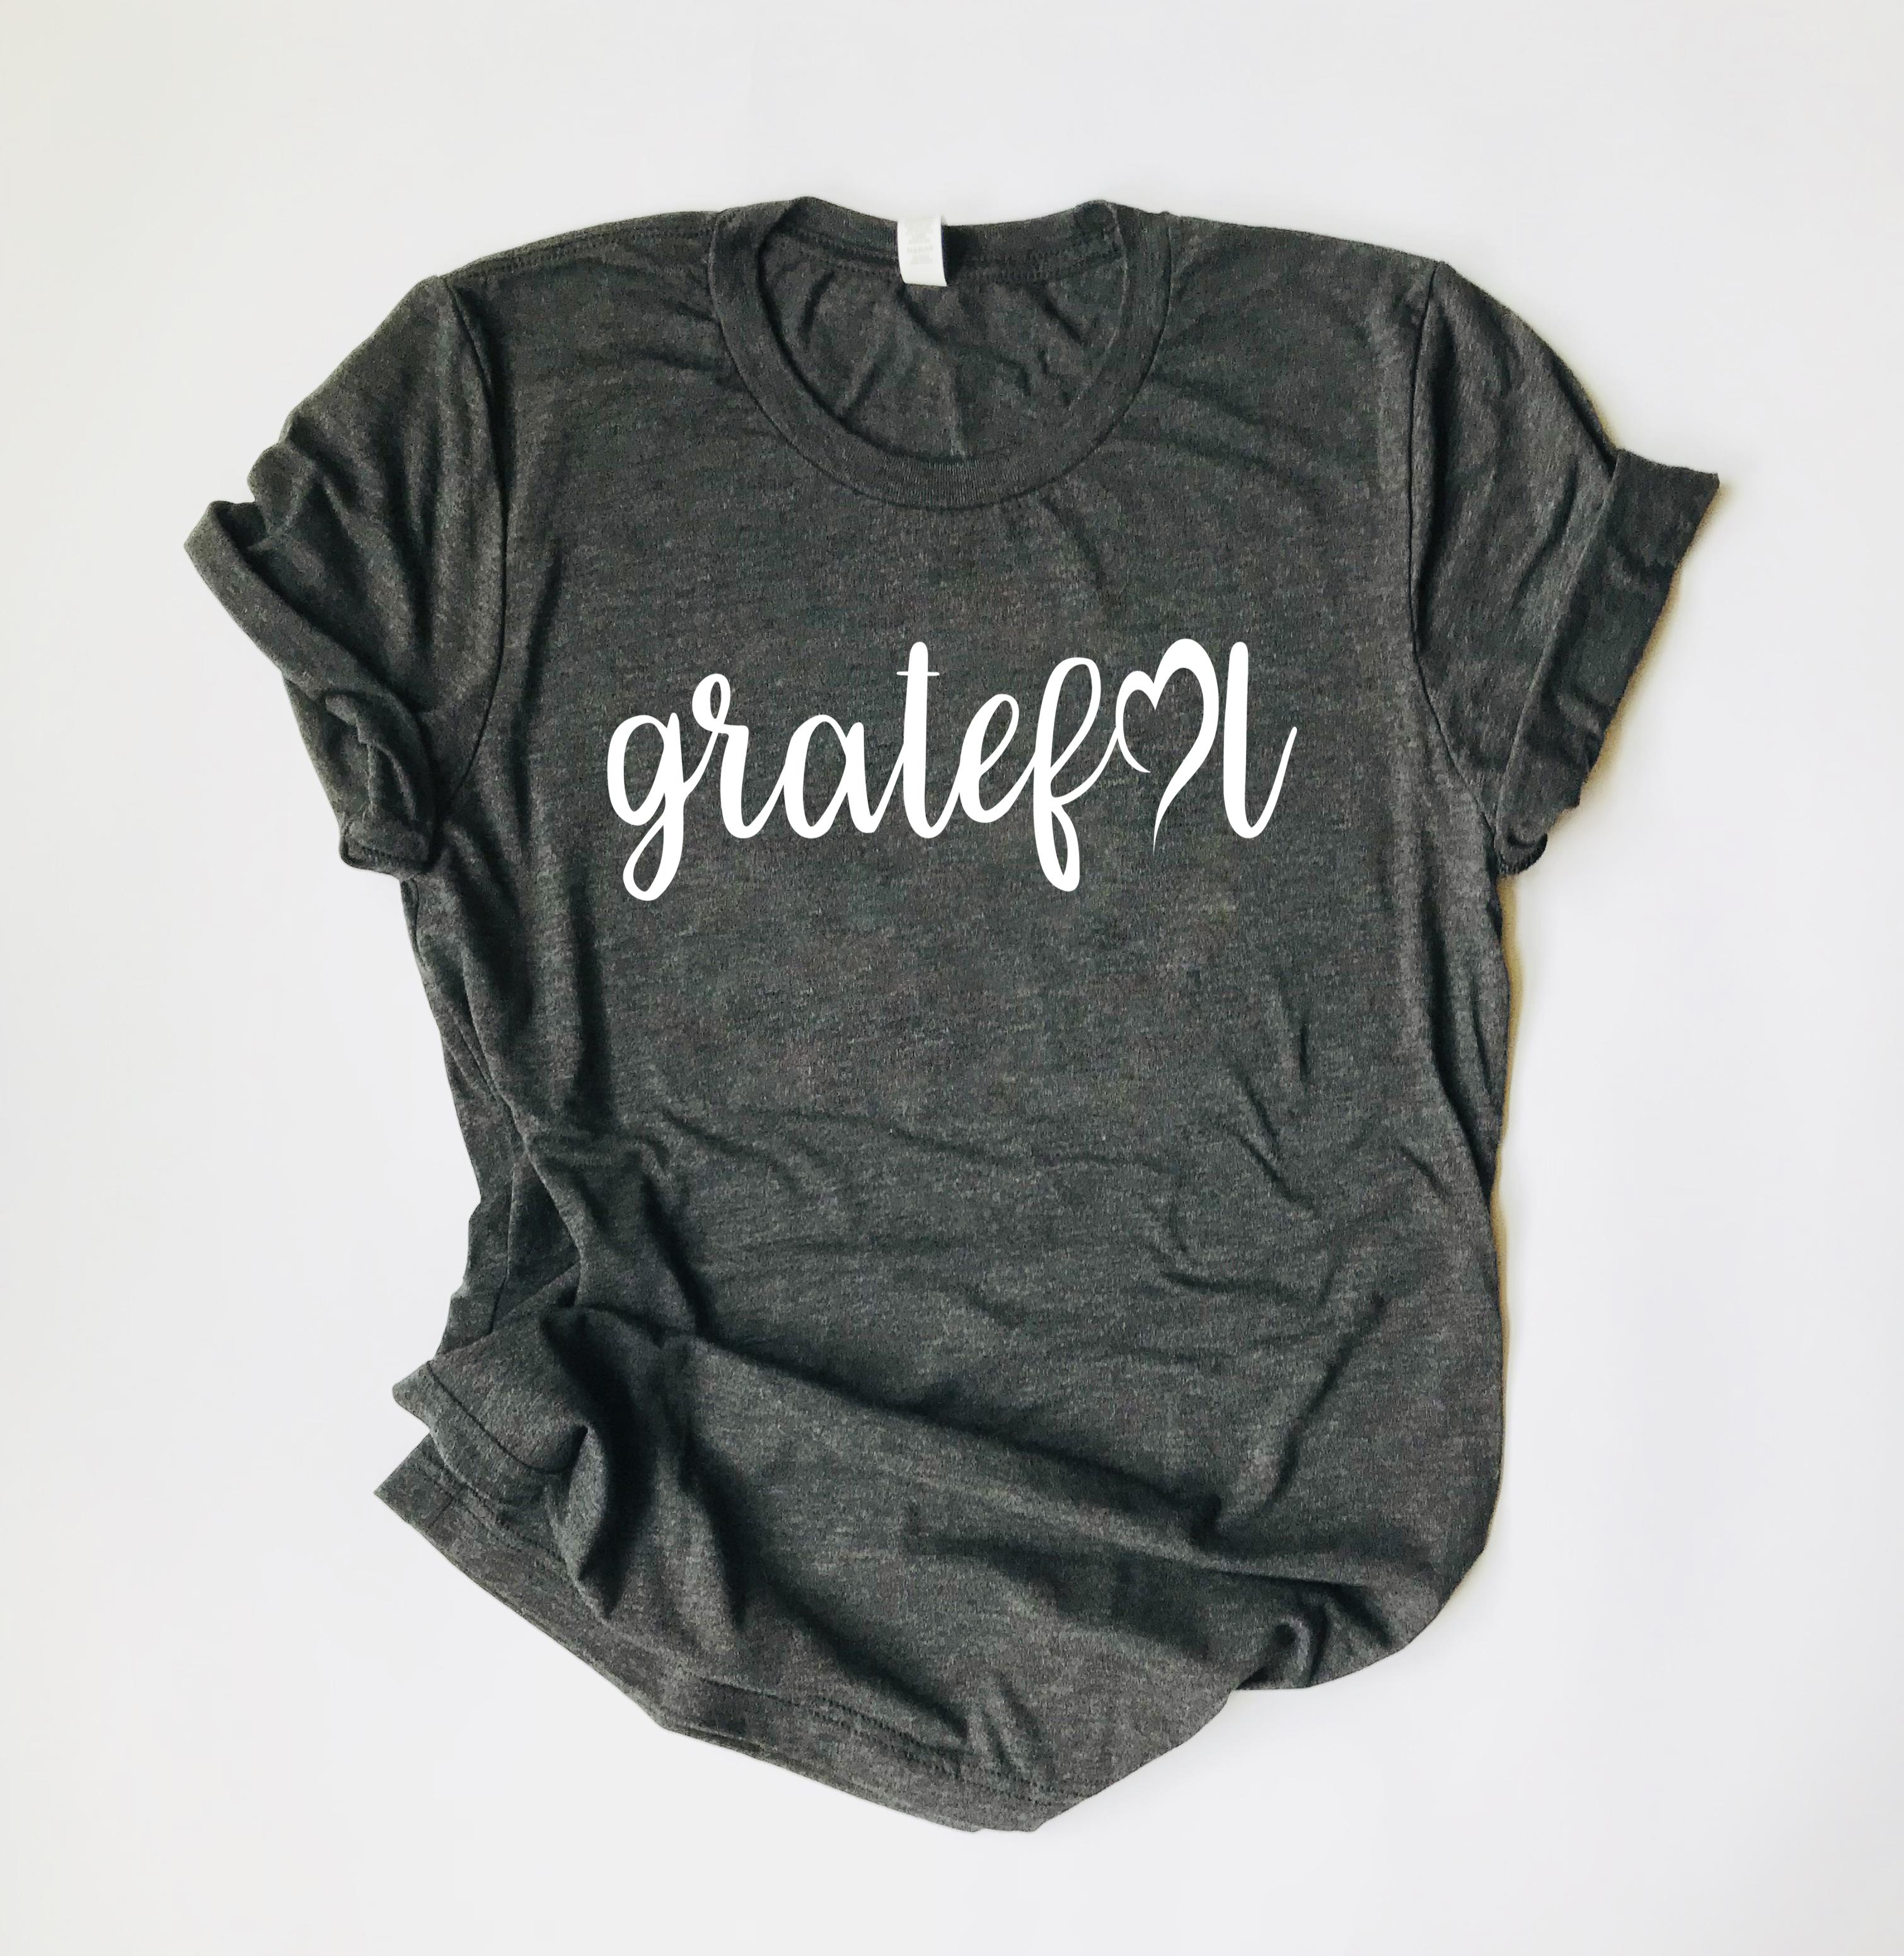 grateful heart triblend t shirt best yoga clothes shirts mom